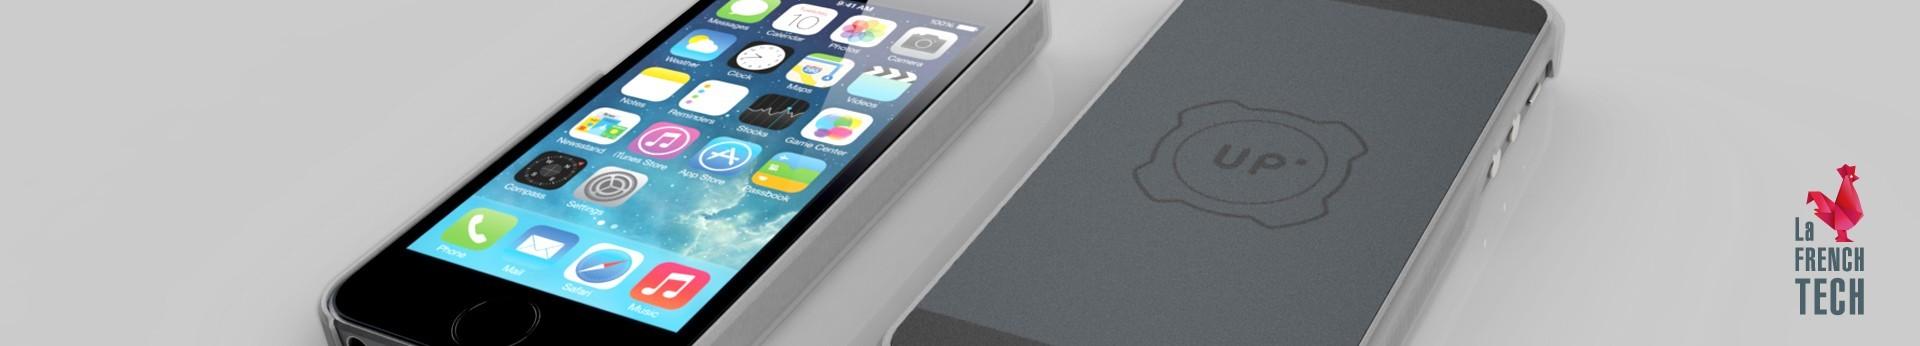 coques induction iphone 5 5s et se chargeurs qi iphone exelium exelium. Black Bedroom Furniture Sets. Home Design Ideas